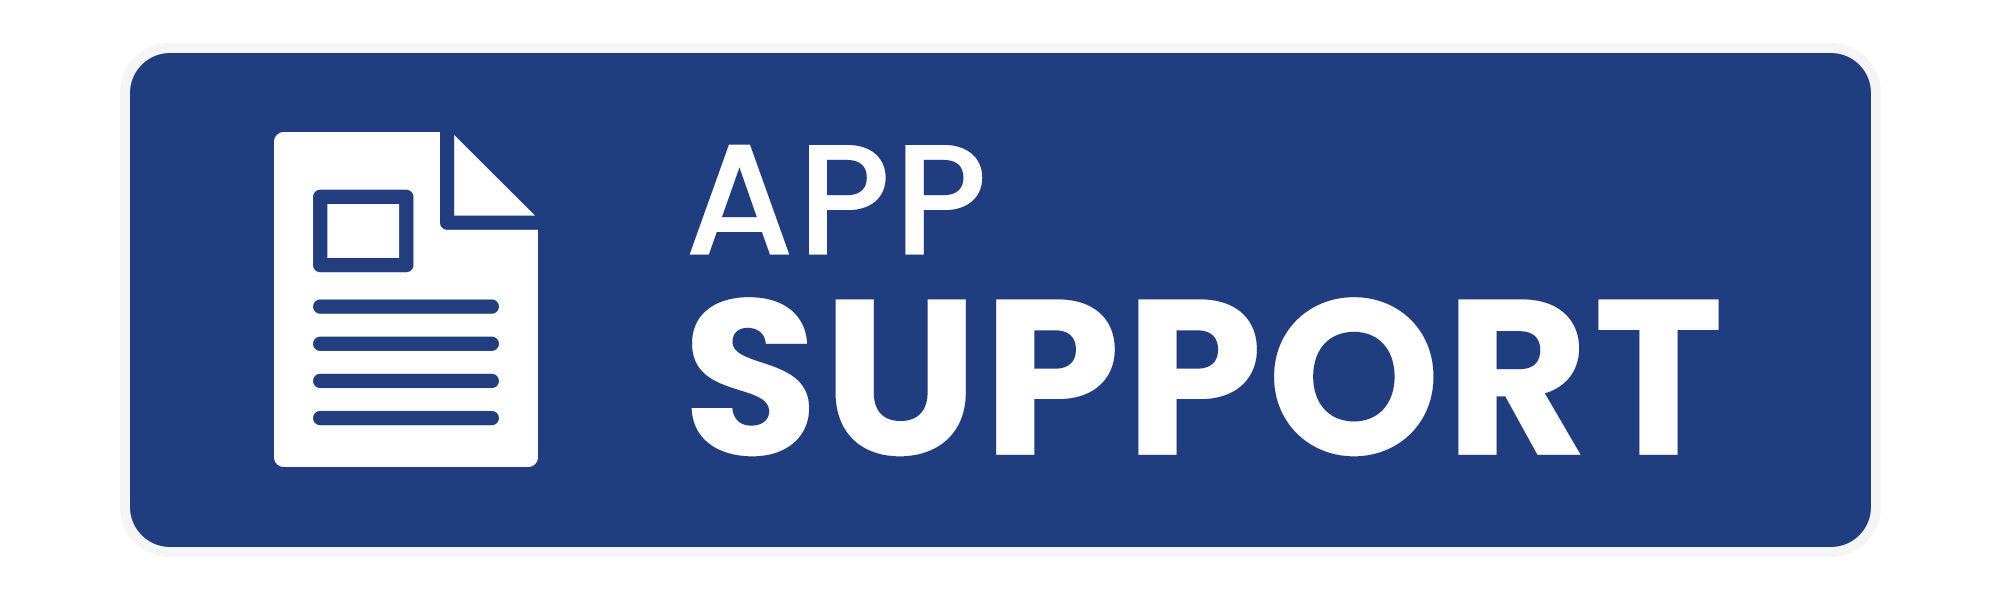 Lorex Home App Support